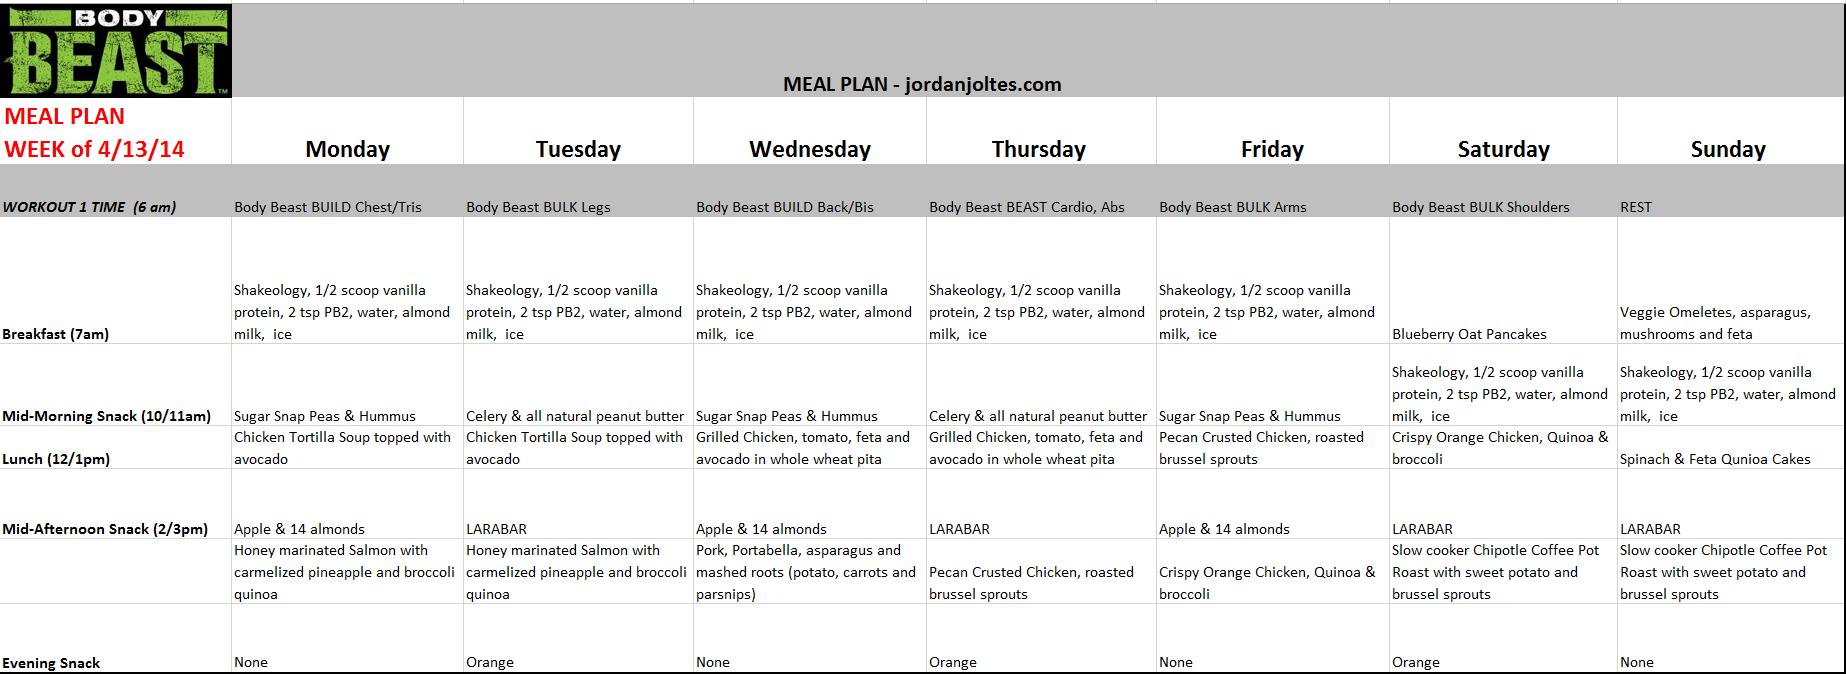 Jjoltes Meal Plan Body Beast 4132014 Body Beast For Women